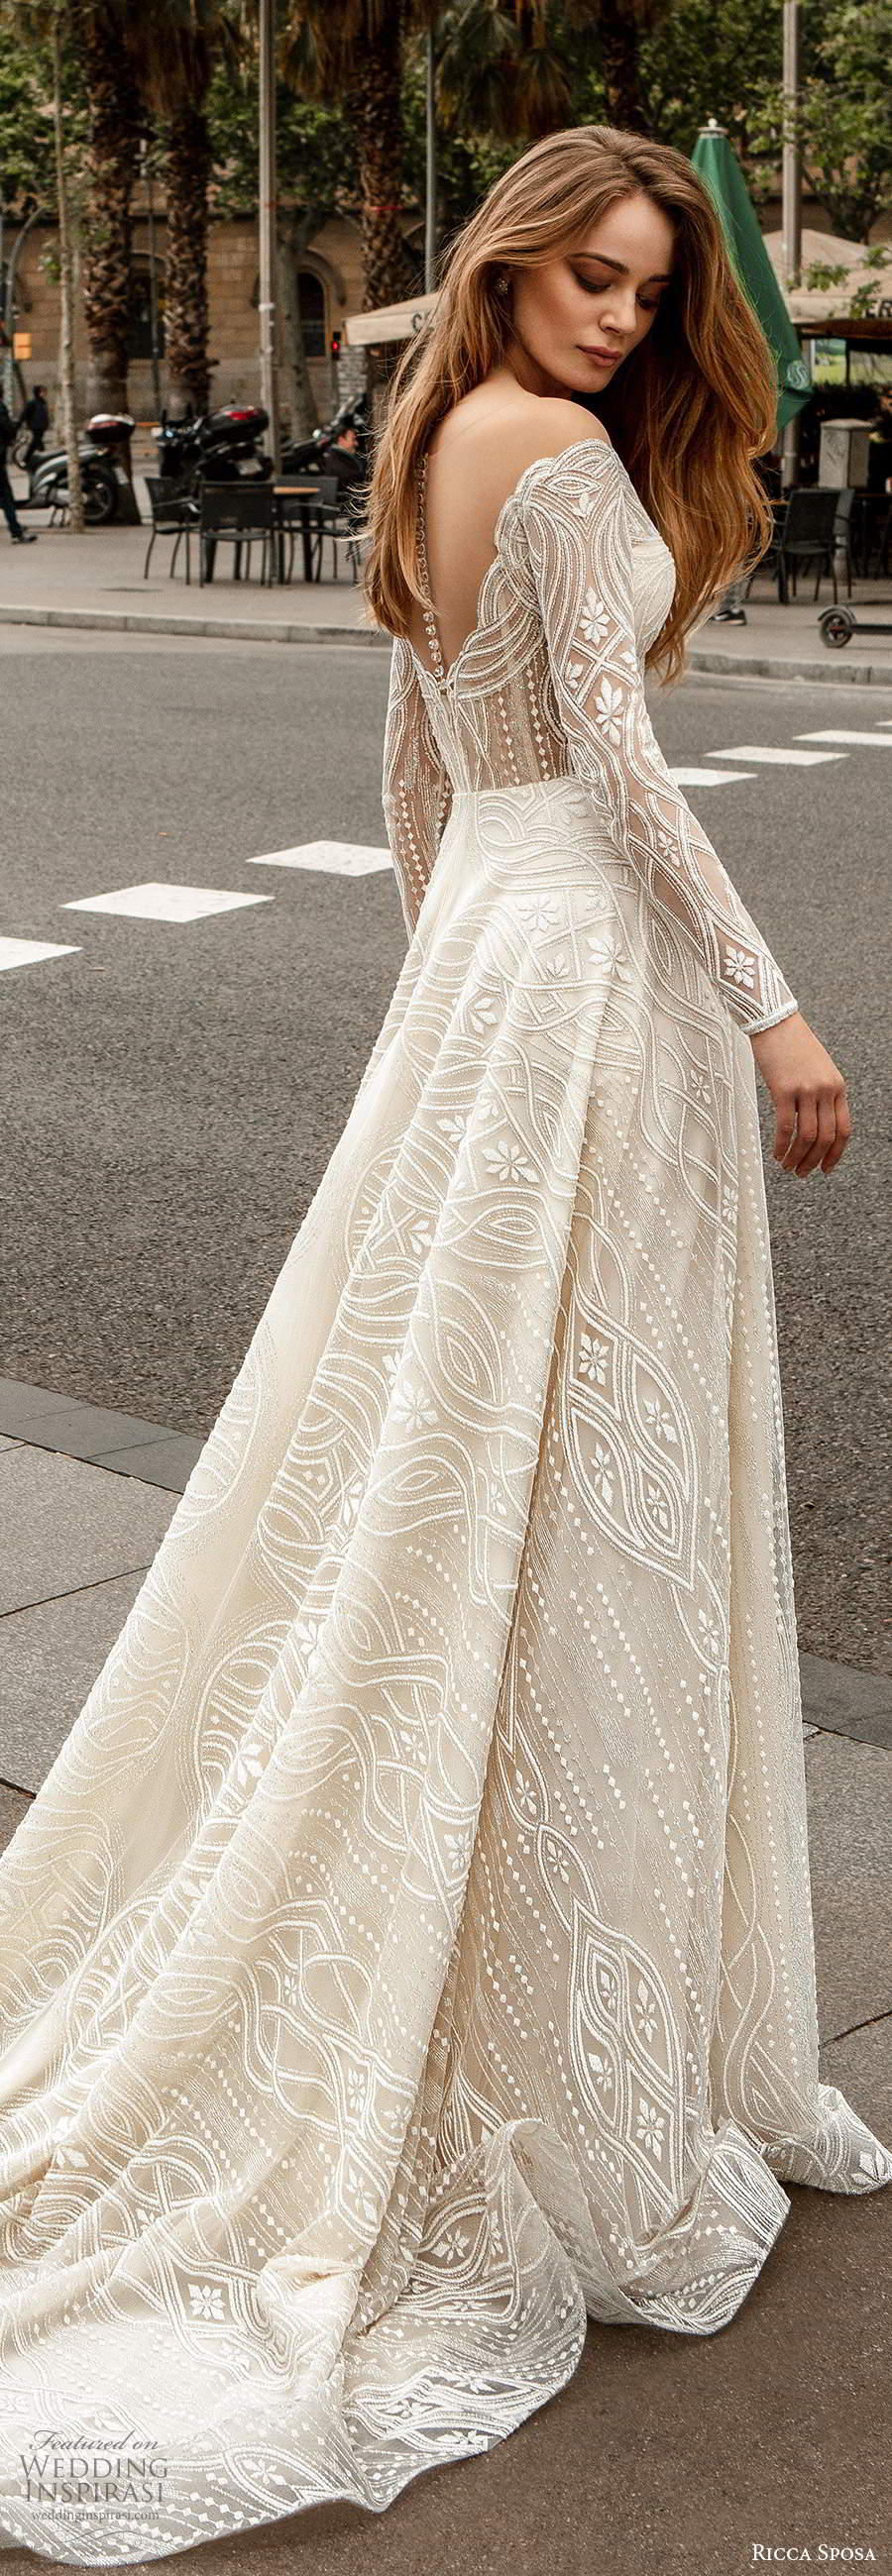 ricca sposa 2020 barcelona bridal off shoulder long sleeves sweetheart neckline fully embellished a line ball gown wedding dress scoop back chapel train (6) bv